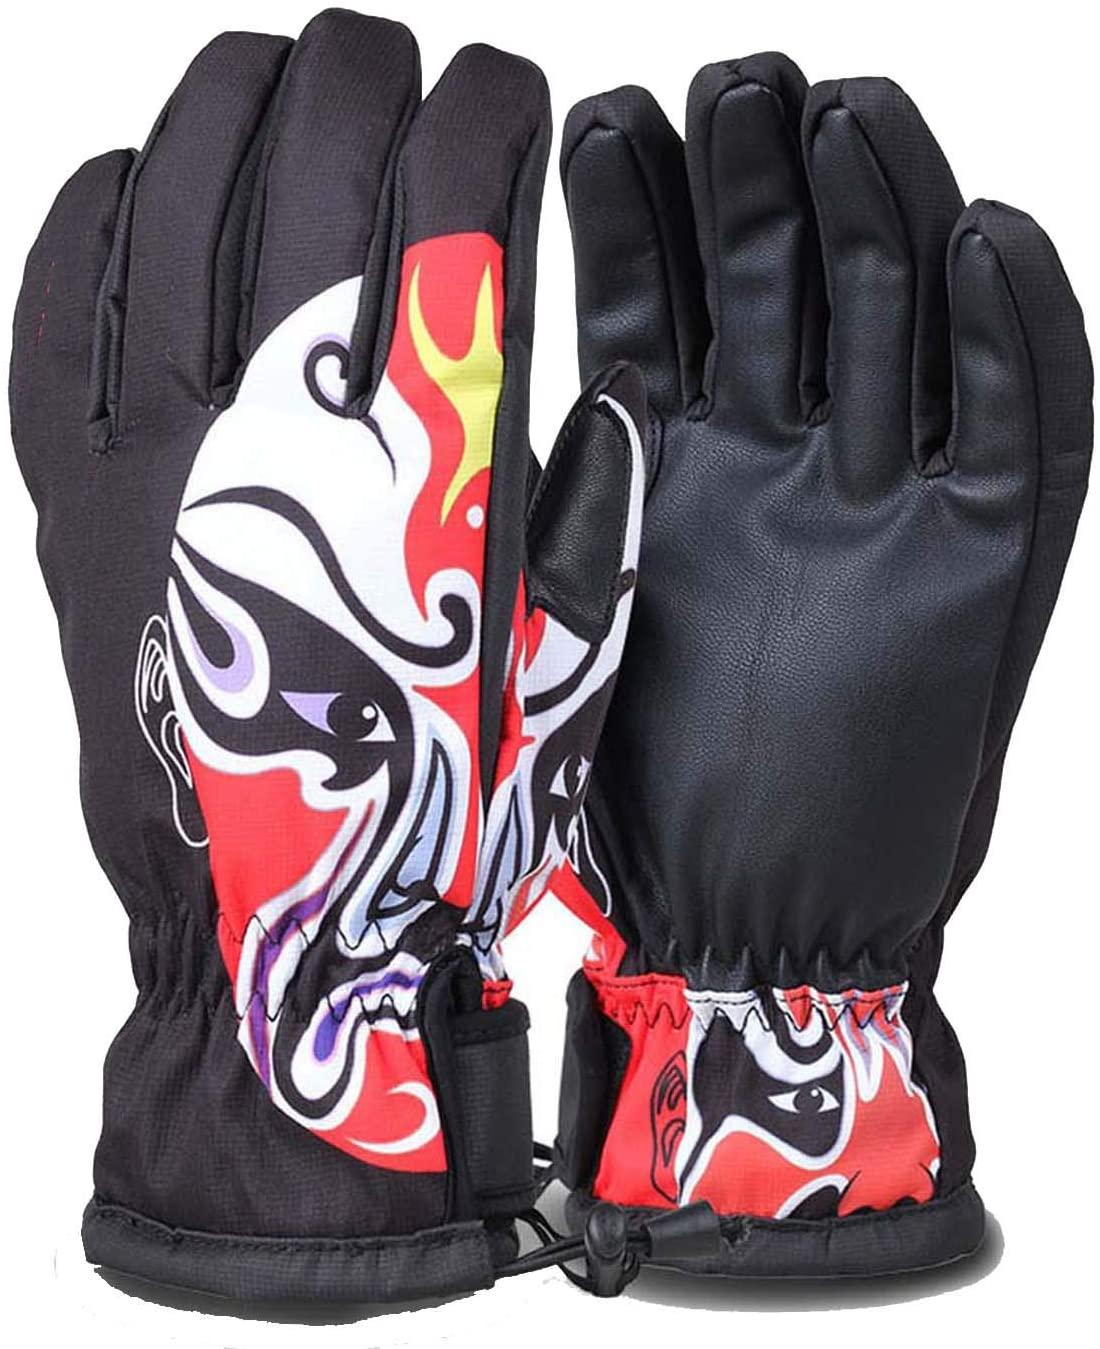 YR5V4V Women Children Waterproof Ski Gloves Motorcycle Cycling Windproof Snowboard Handwear Fleece Thermal Skiing Gloves,B,L